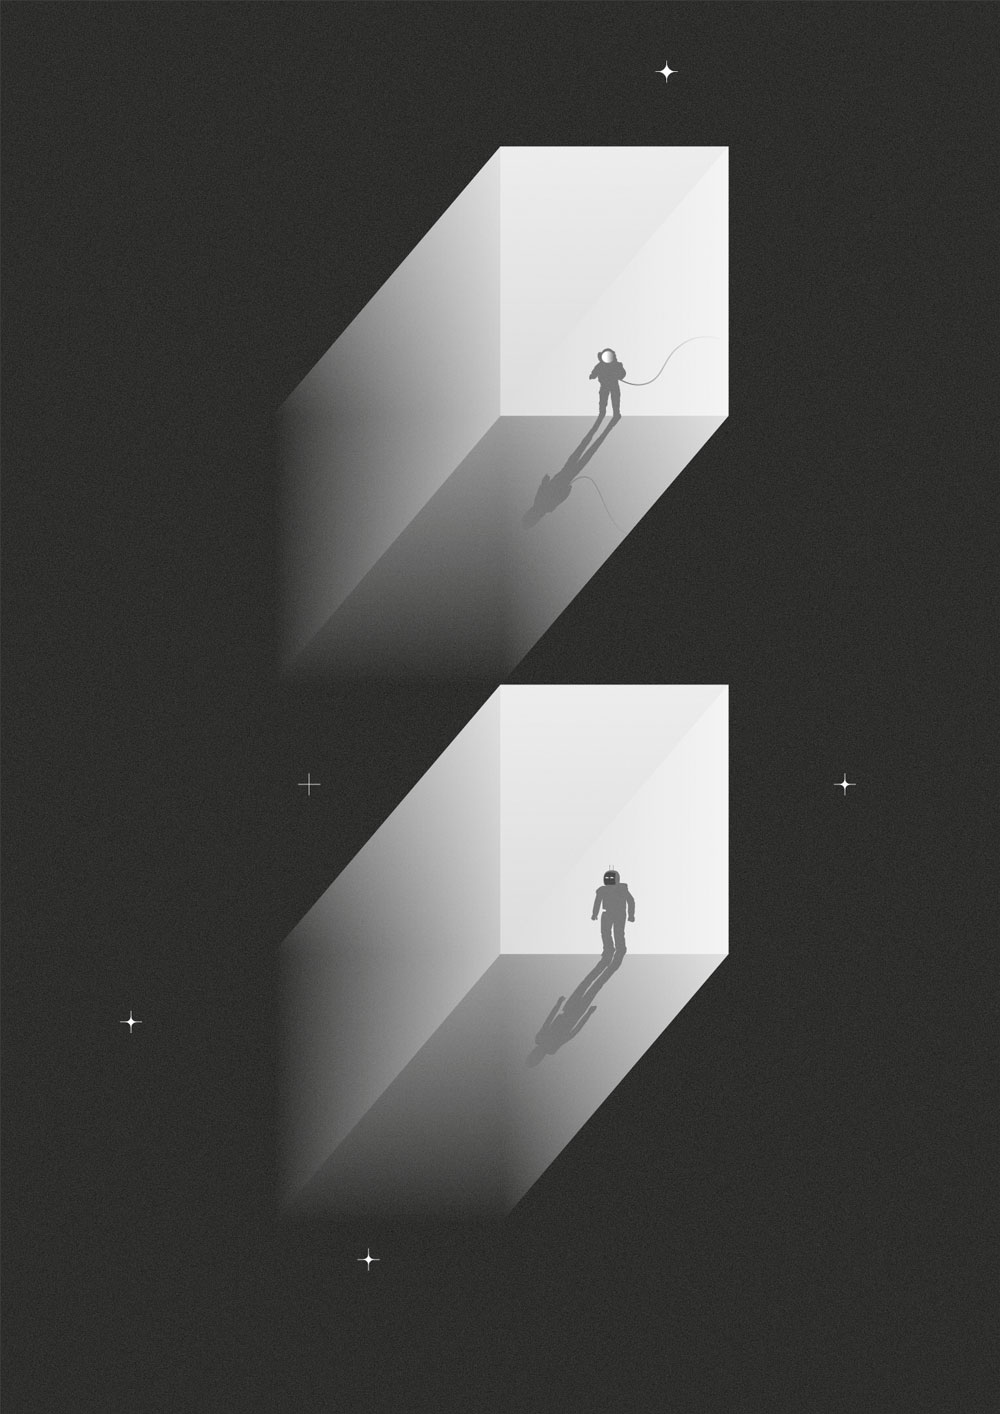 zr-space4